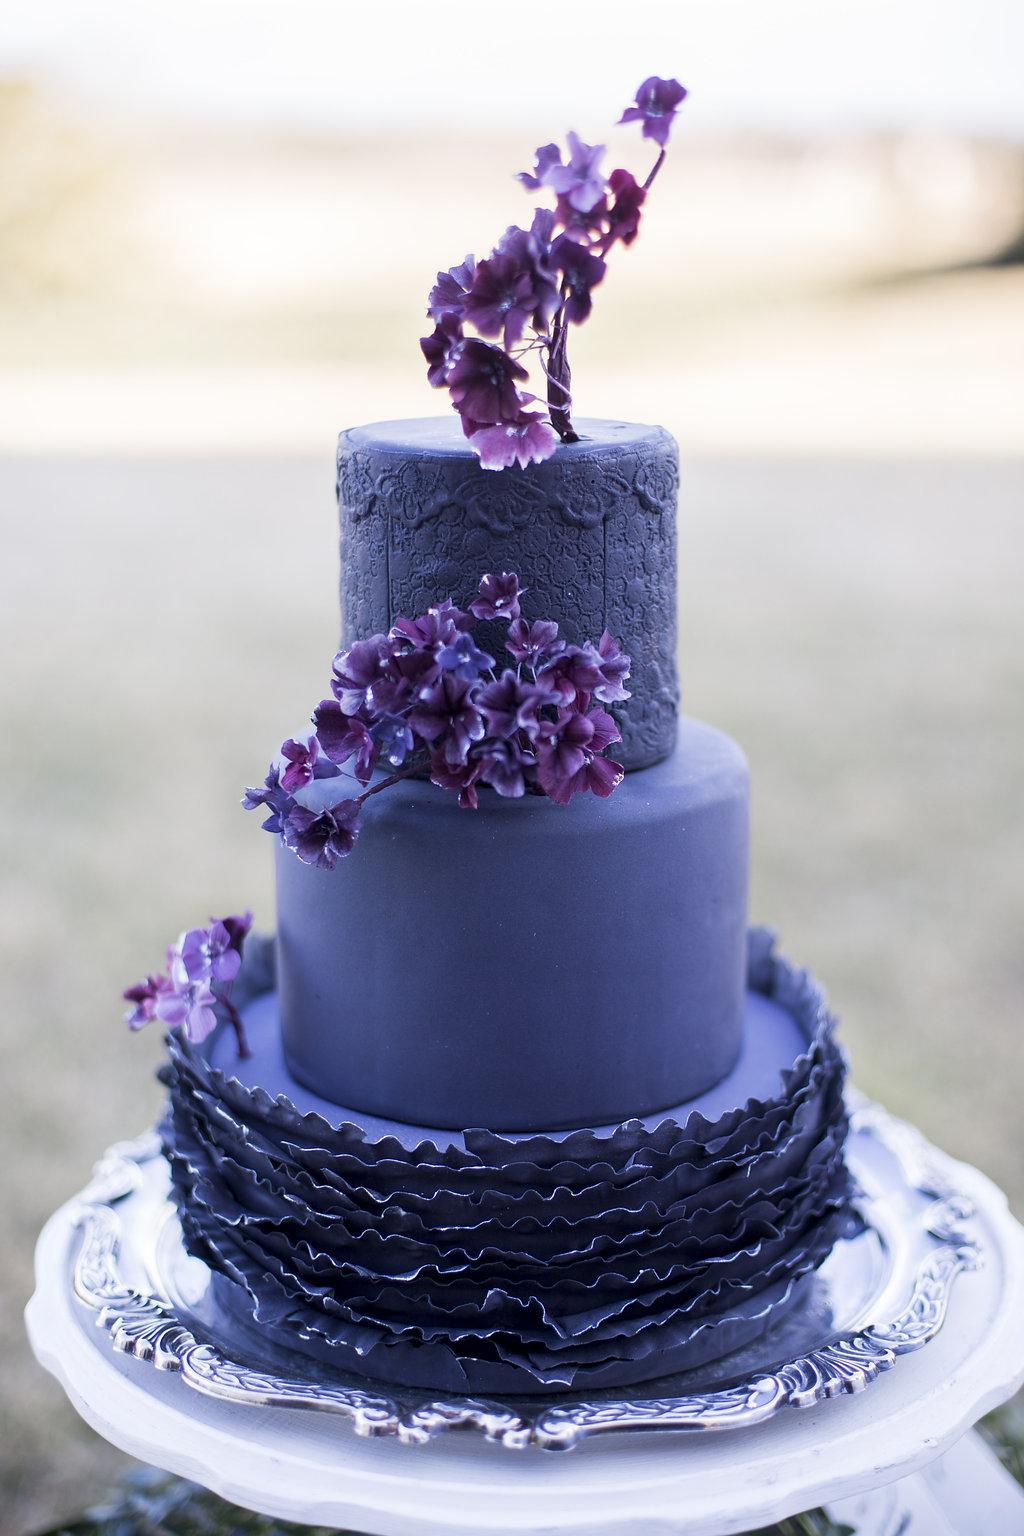 deep purple wedding cake elizabeth anne designs the wedding blog. Black Bedroom Furniture Sets. Home Design Ideas